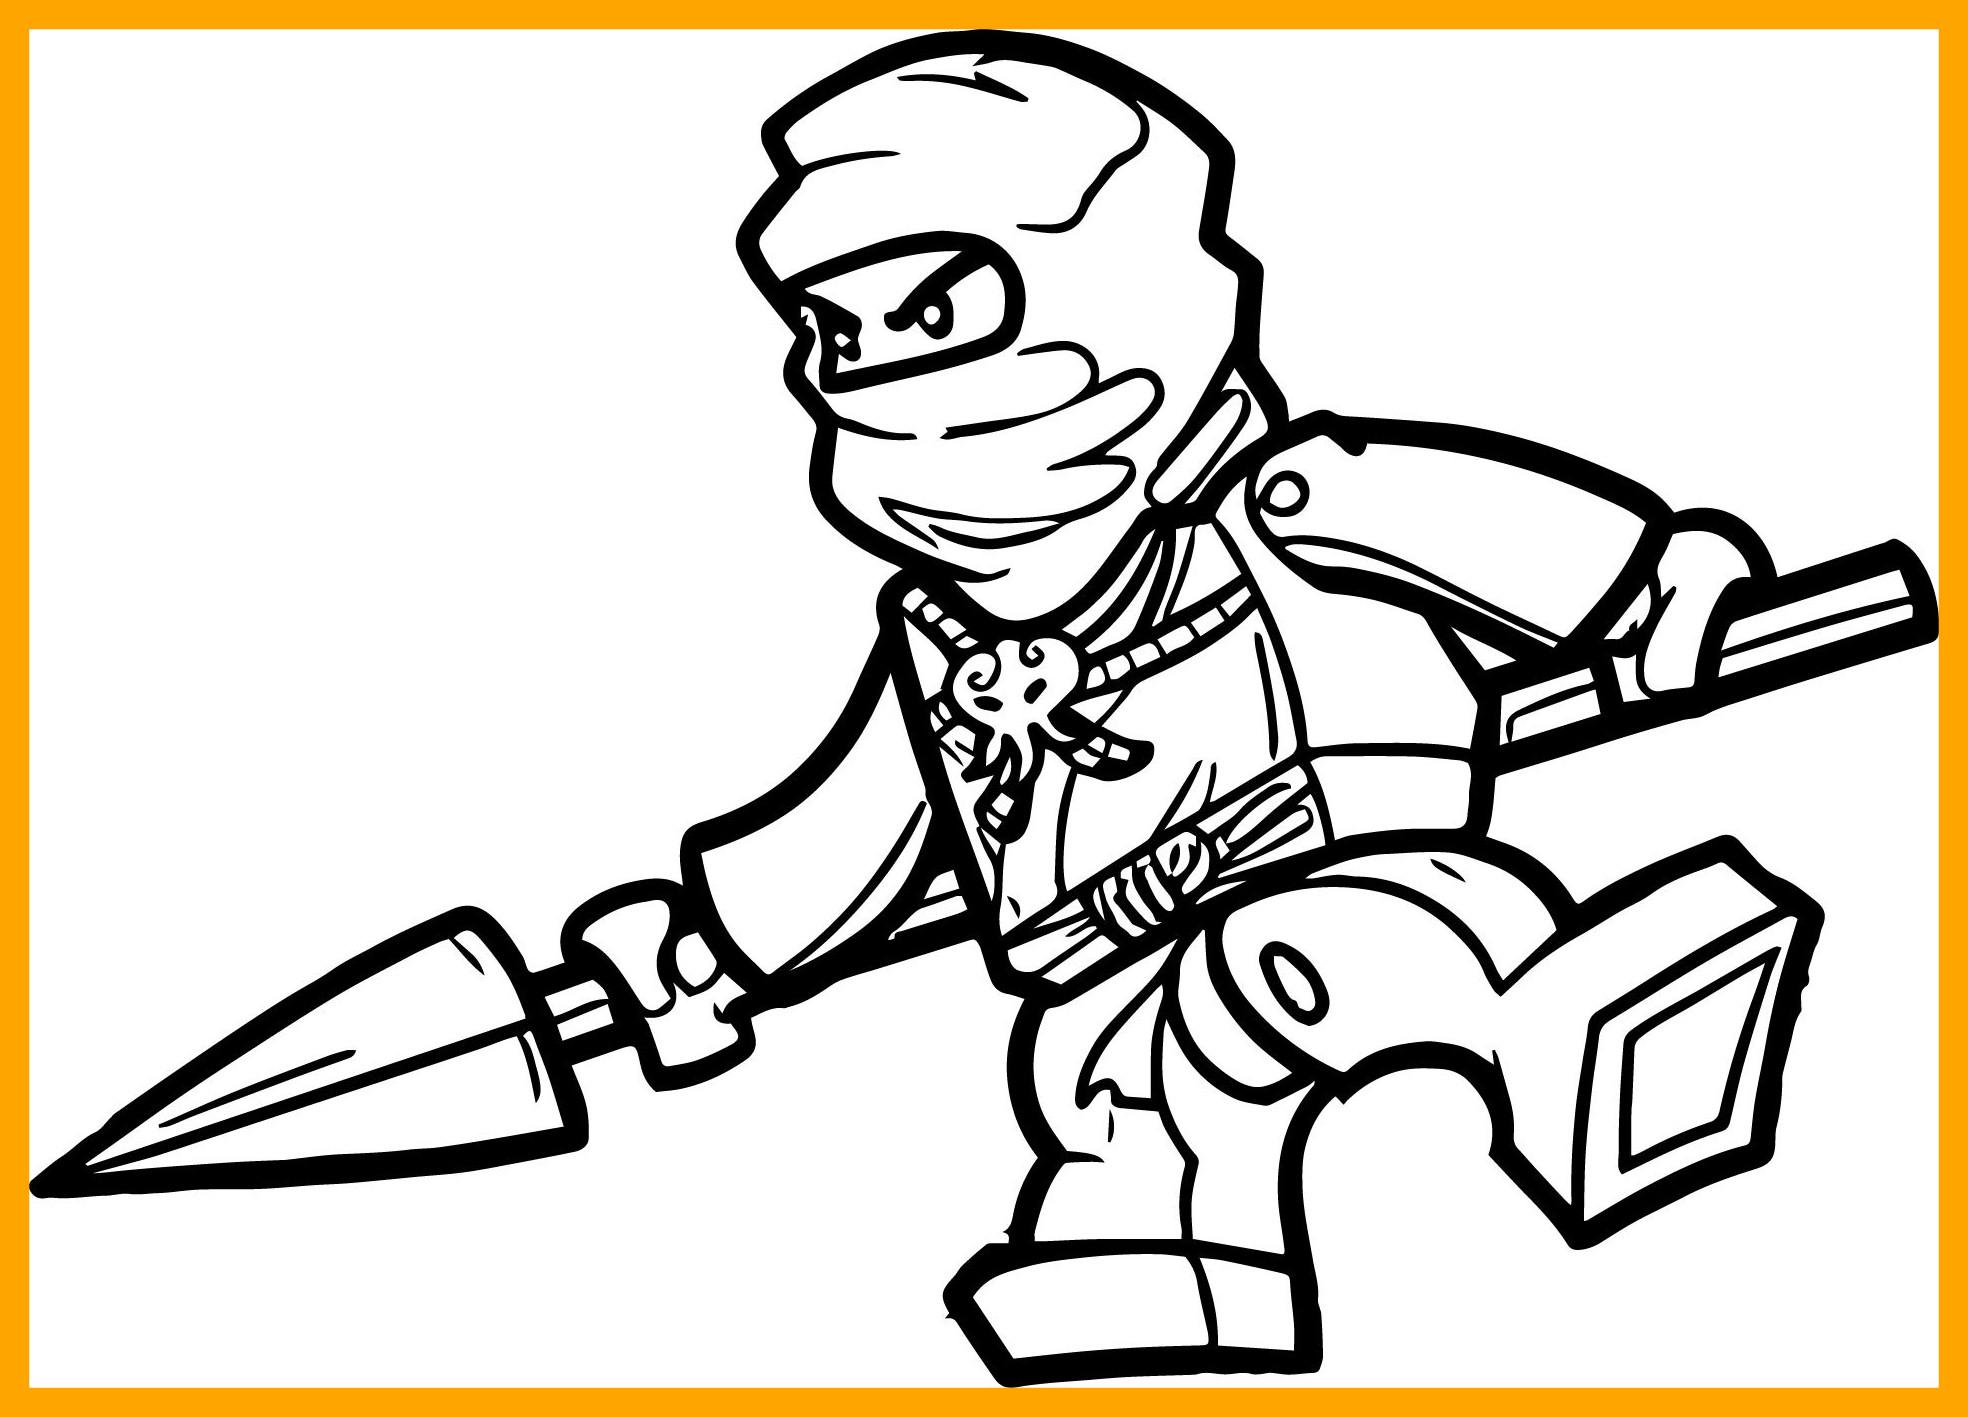 Lego Ninjago Colouring Pages To Print at GetDrawings ...